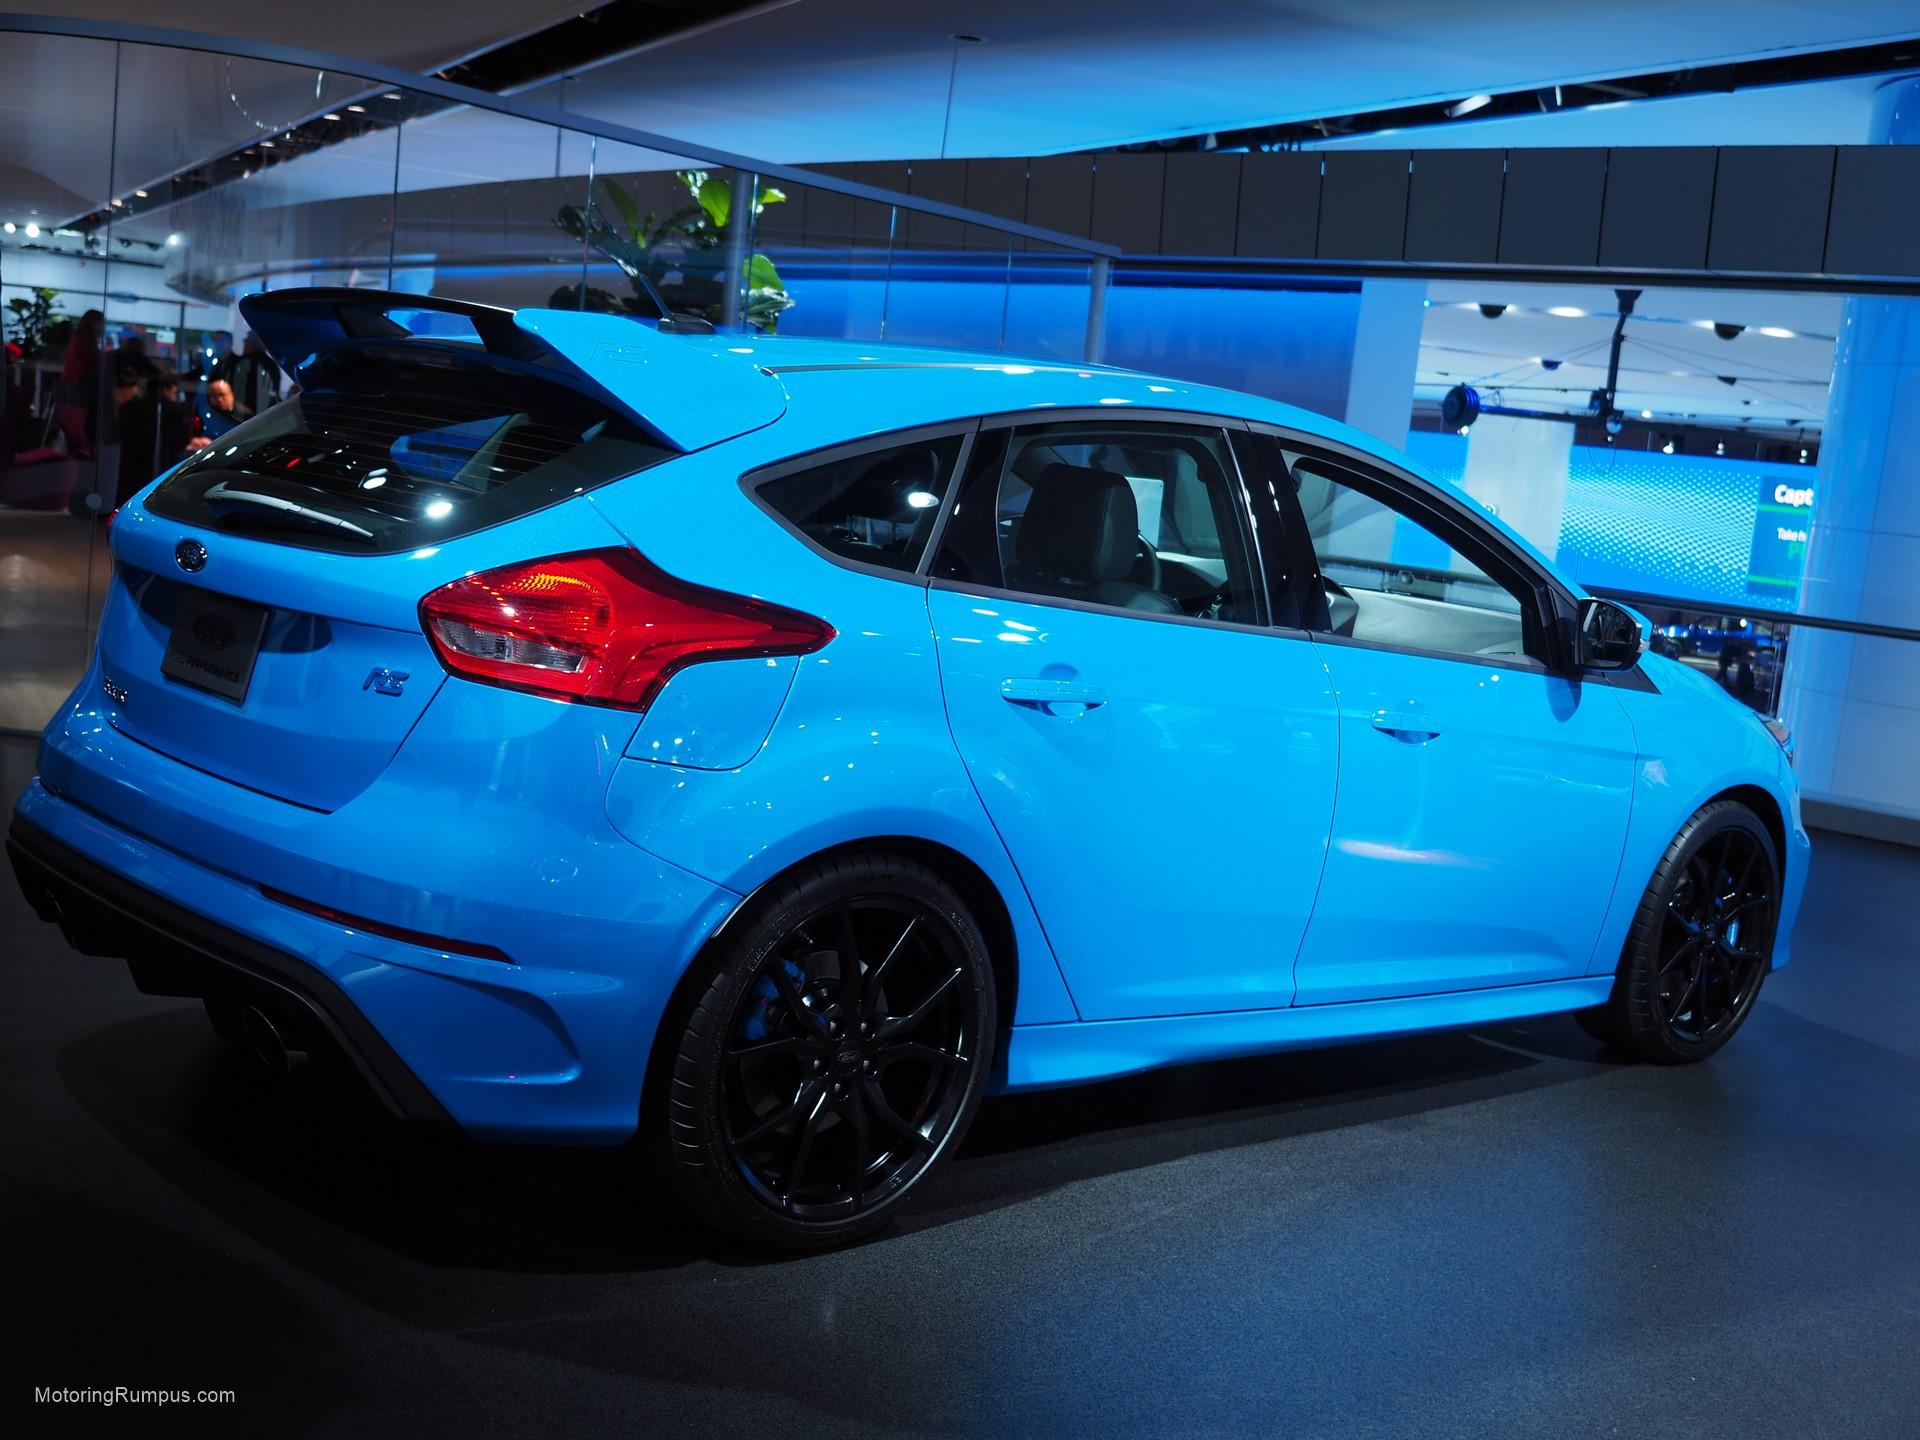 2016 Naias Ford Focus Rs Nitrous Blue Motoring Rumpus